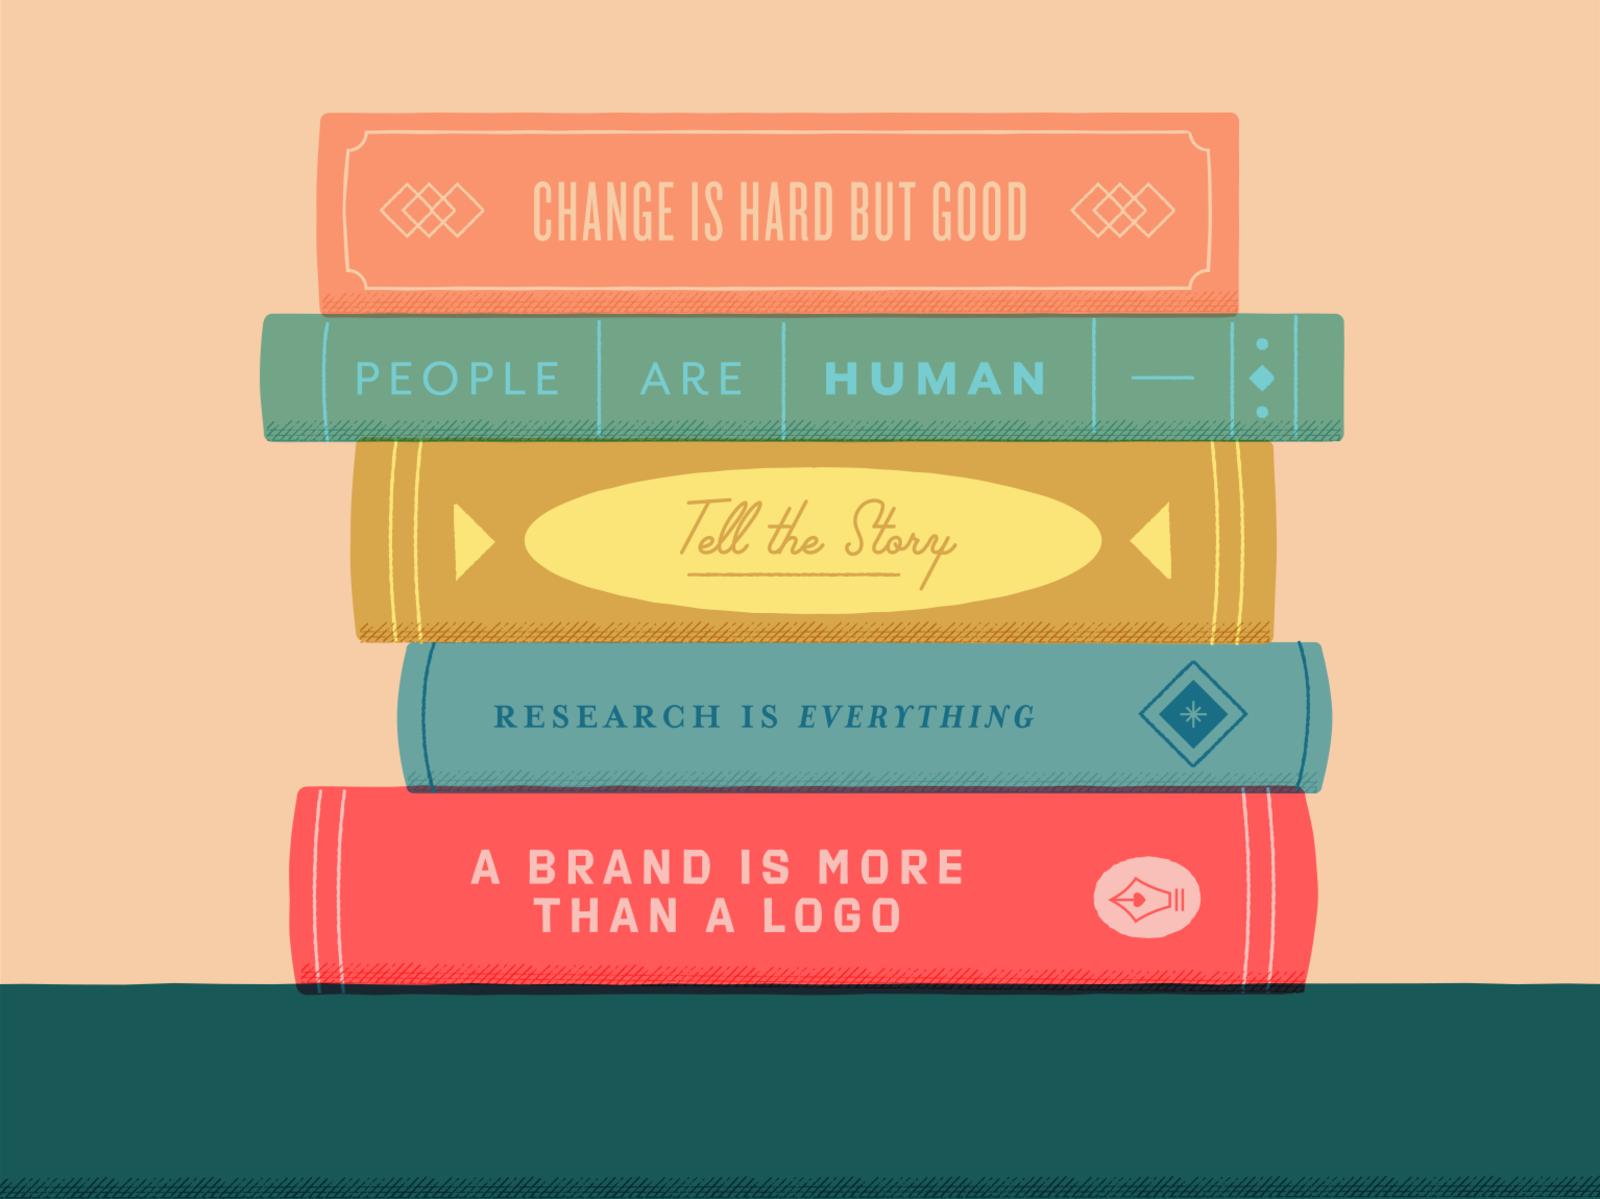 5 Key Things by Lauren Castro